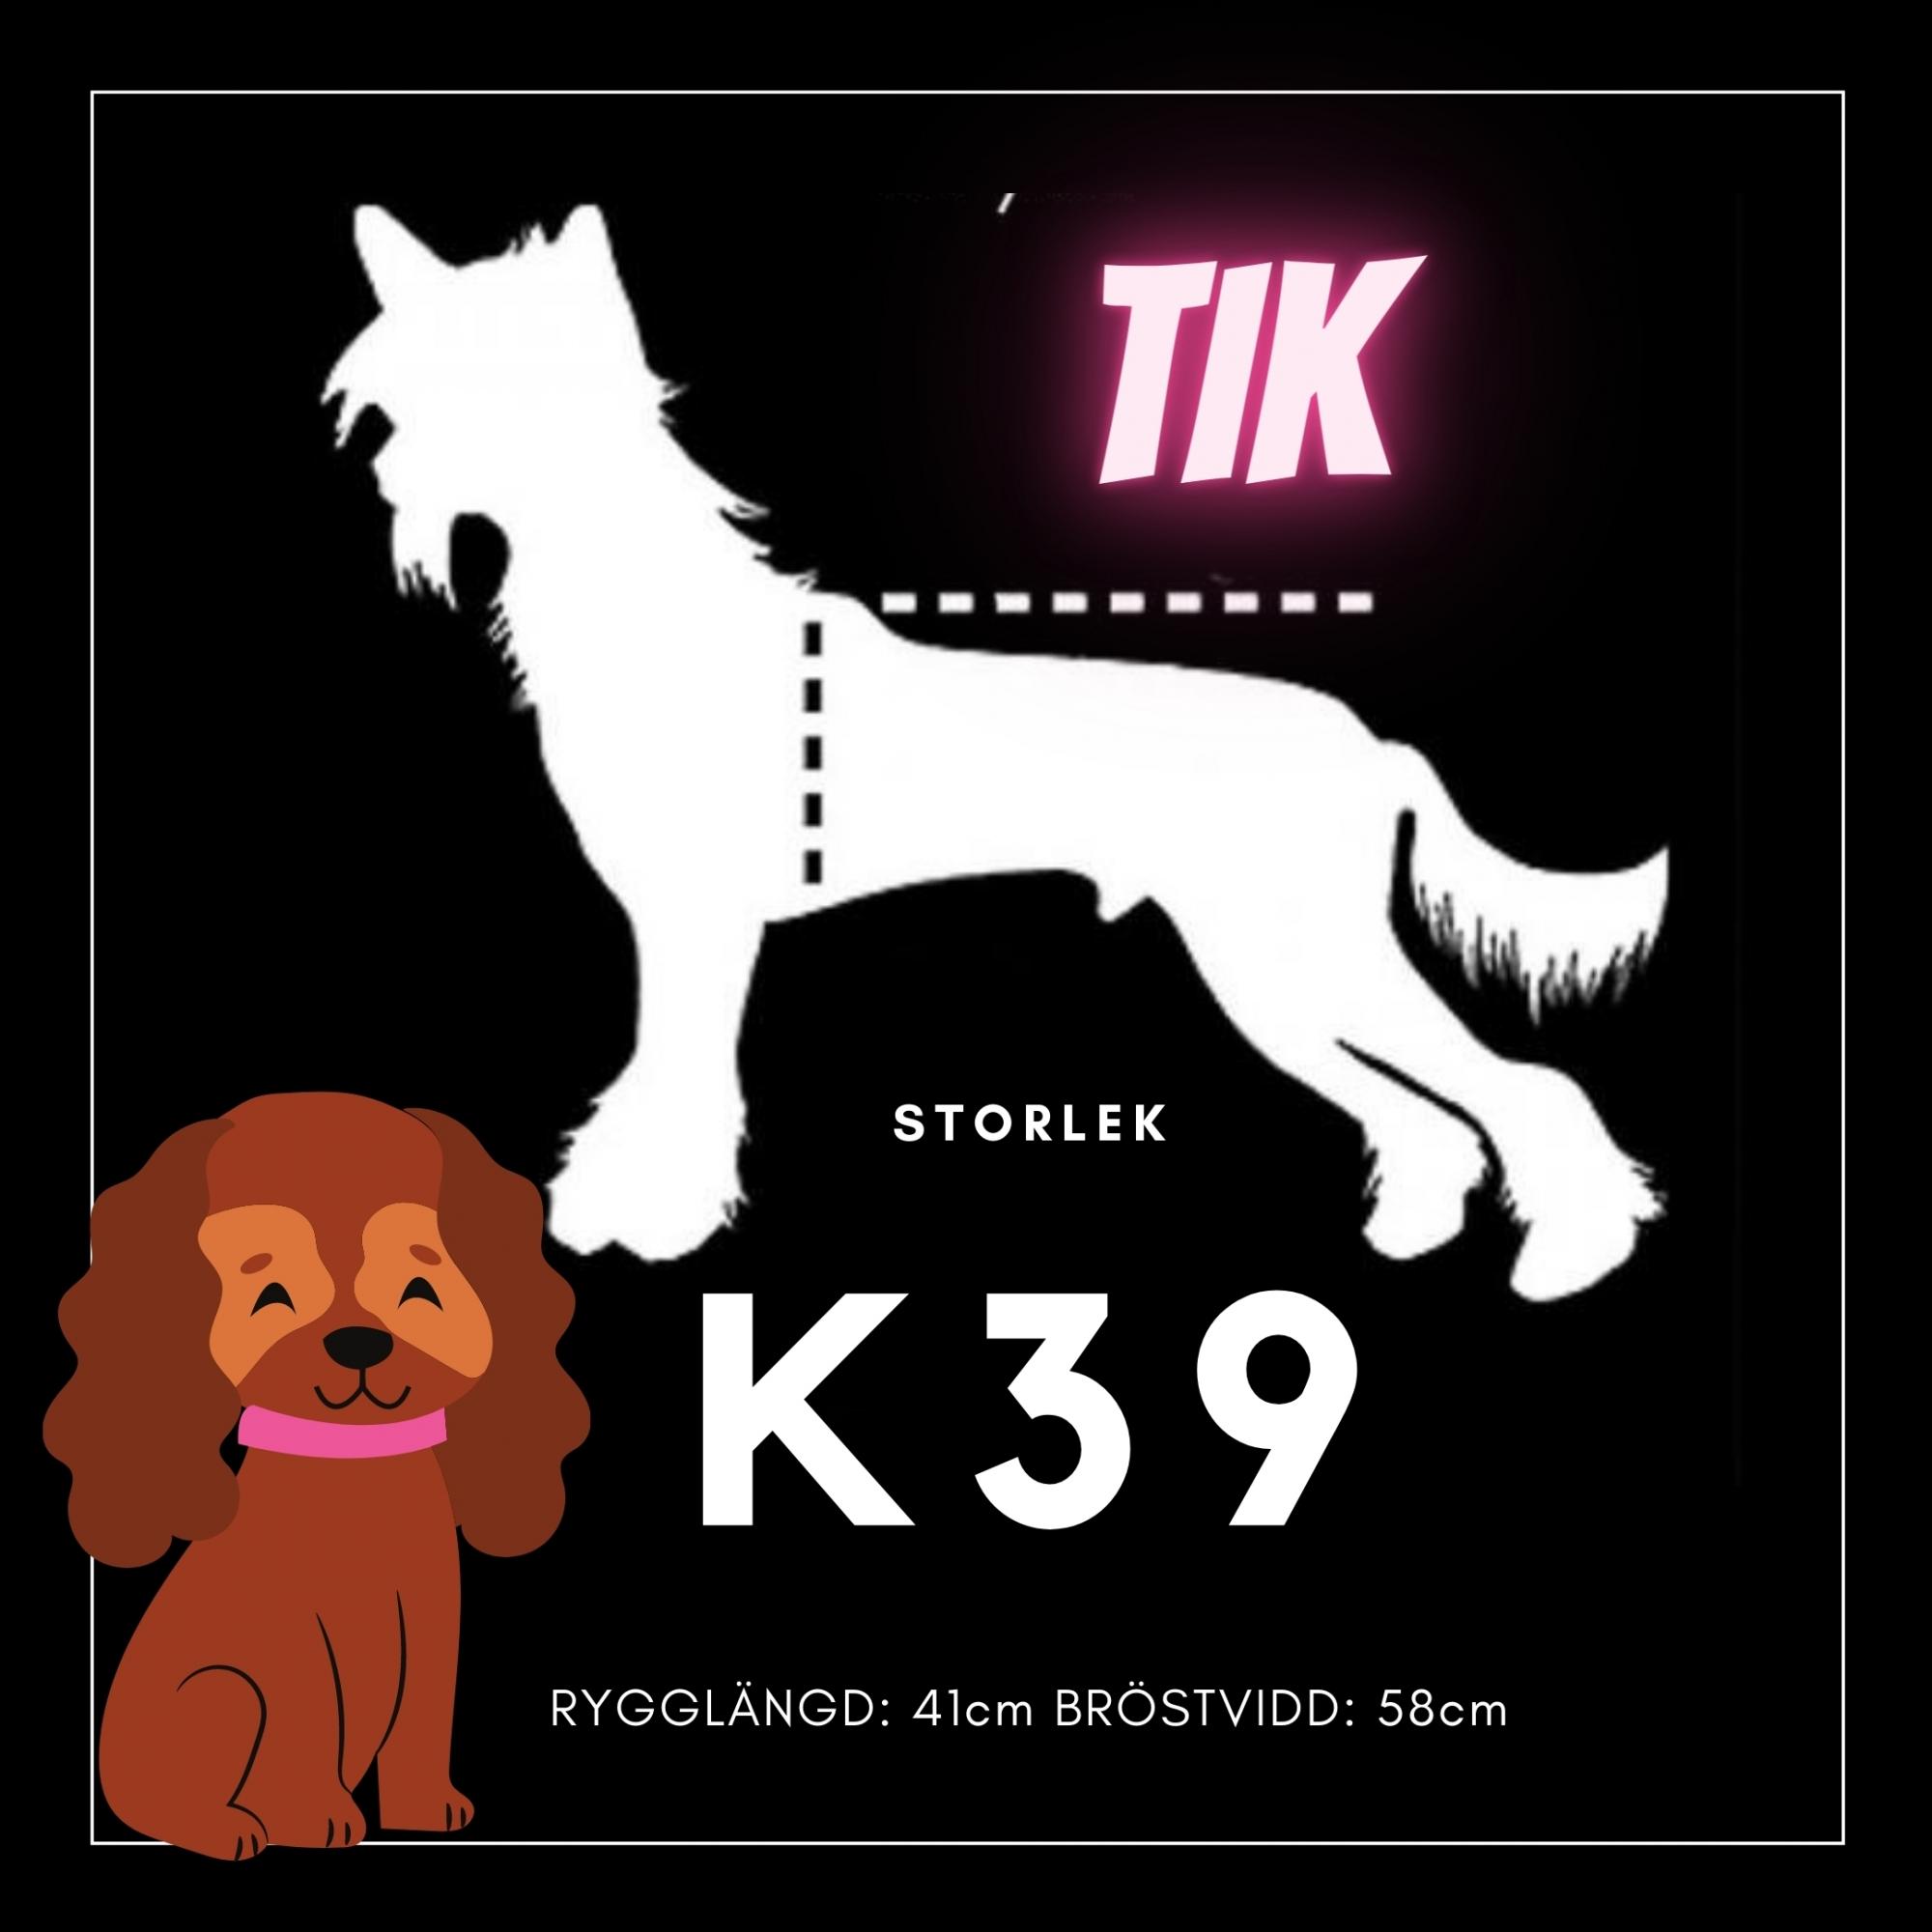 Tik Storlek K39 - Passion For Pet Fashion